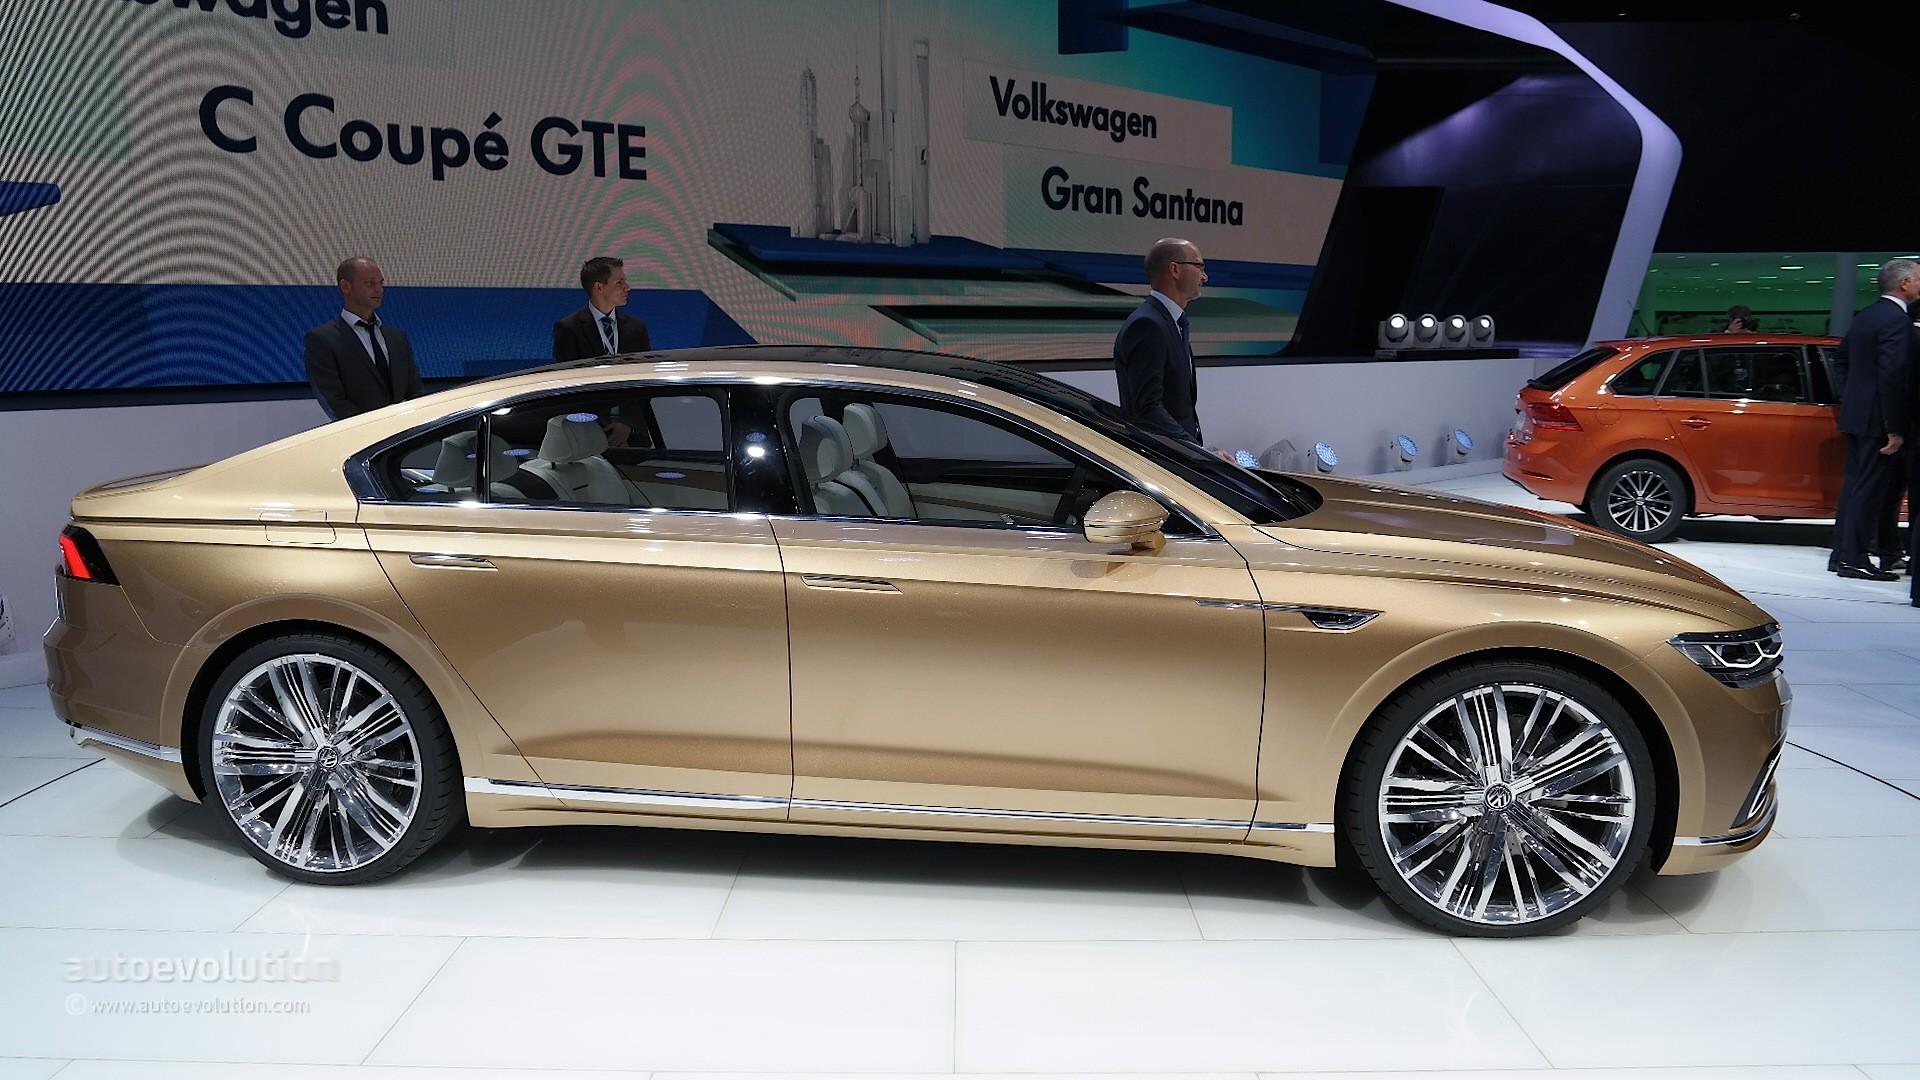 Volkswagen C Coupe GTE Previews New Sub-Phaeton Sedan at ...